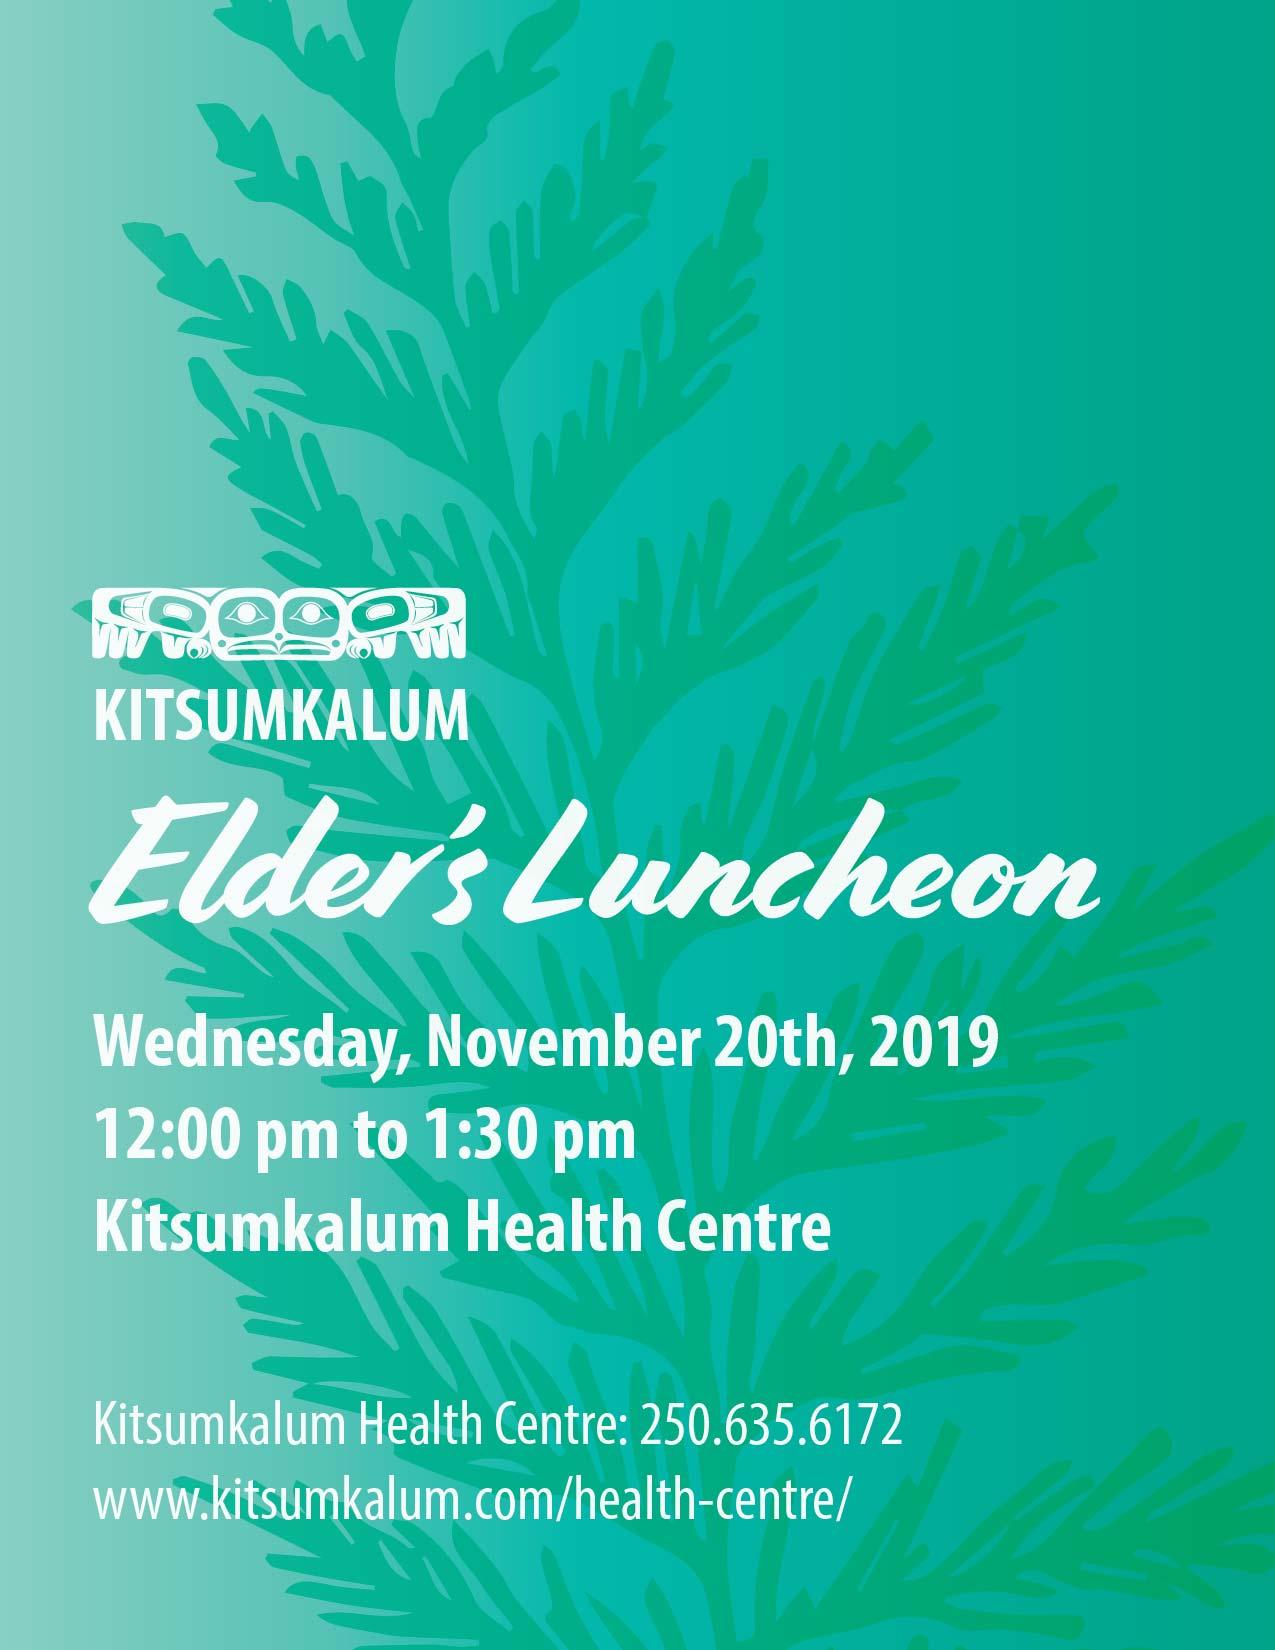 Elder's Luncheon November 20th